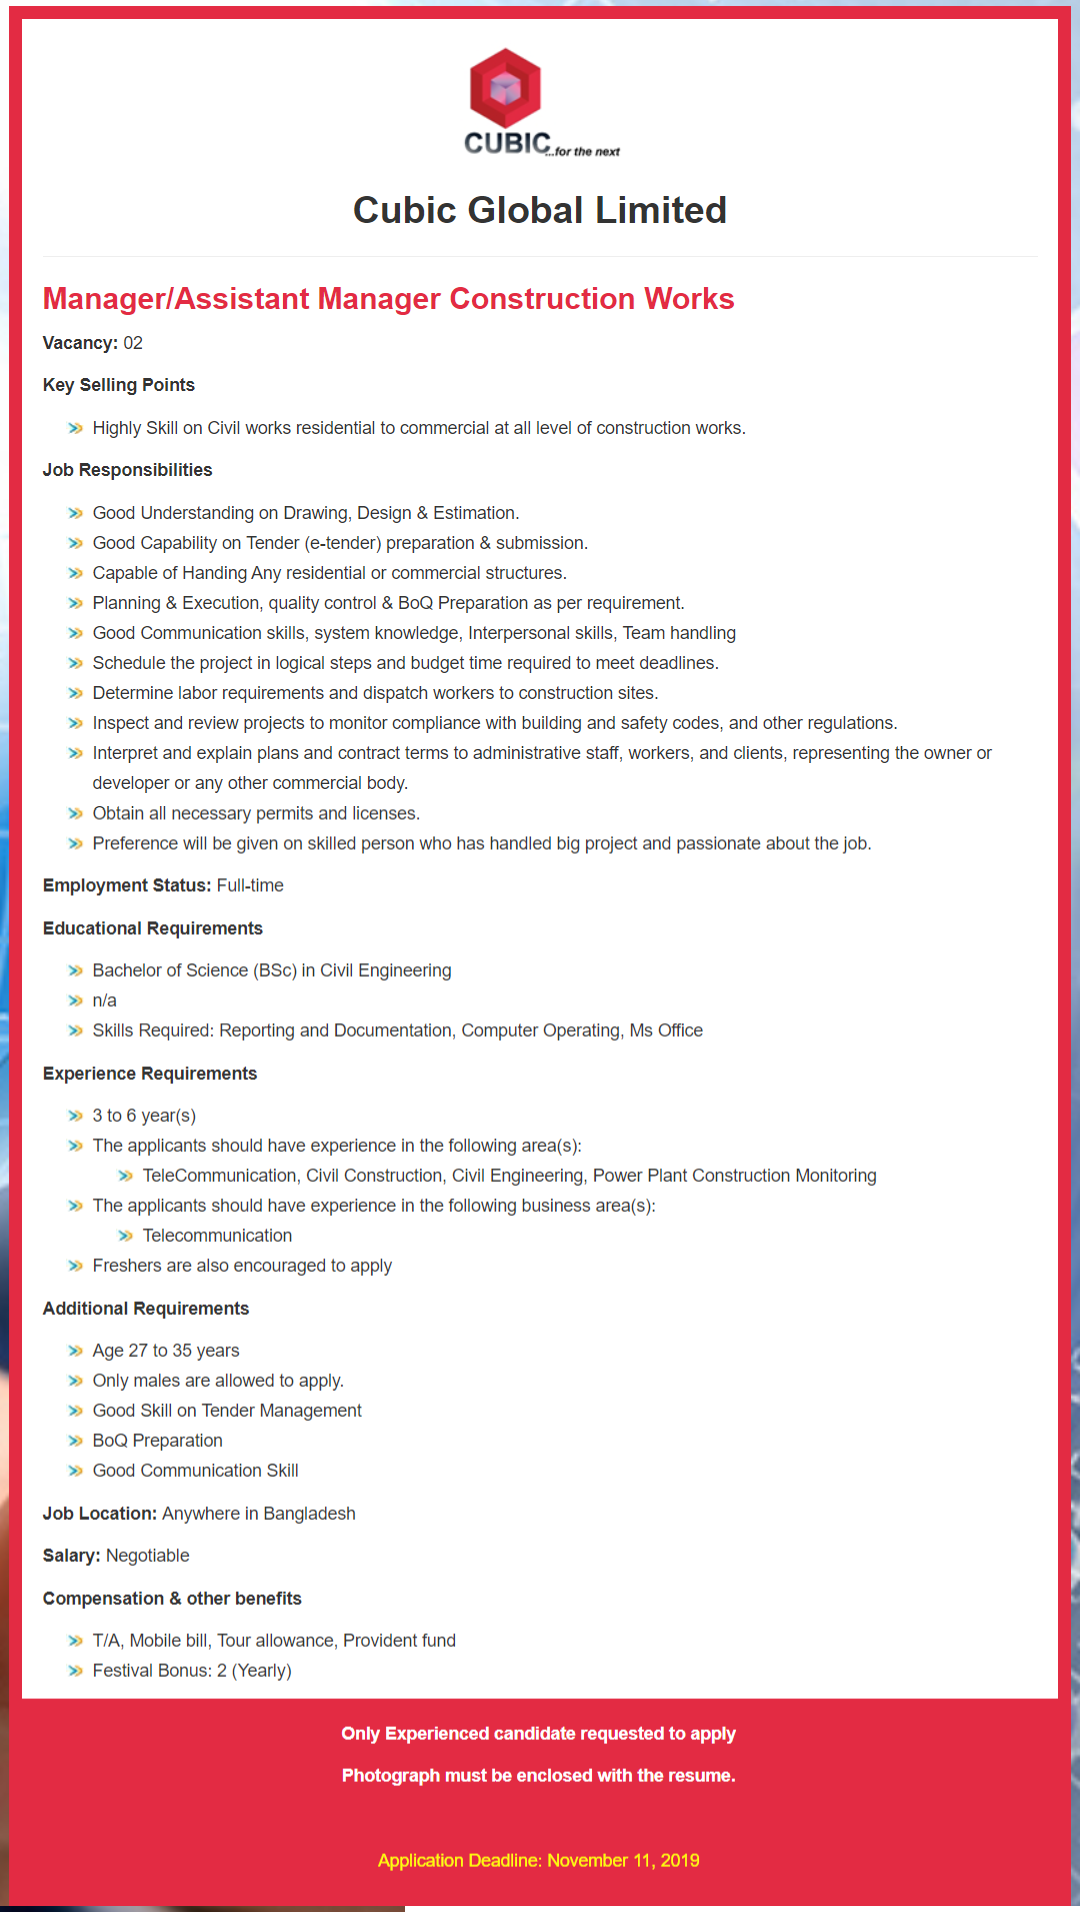 Cubic Global Limited Job Circular 2019